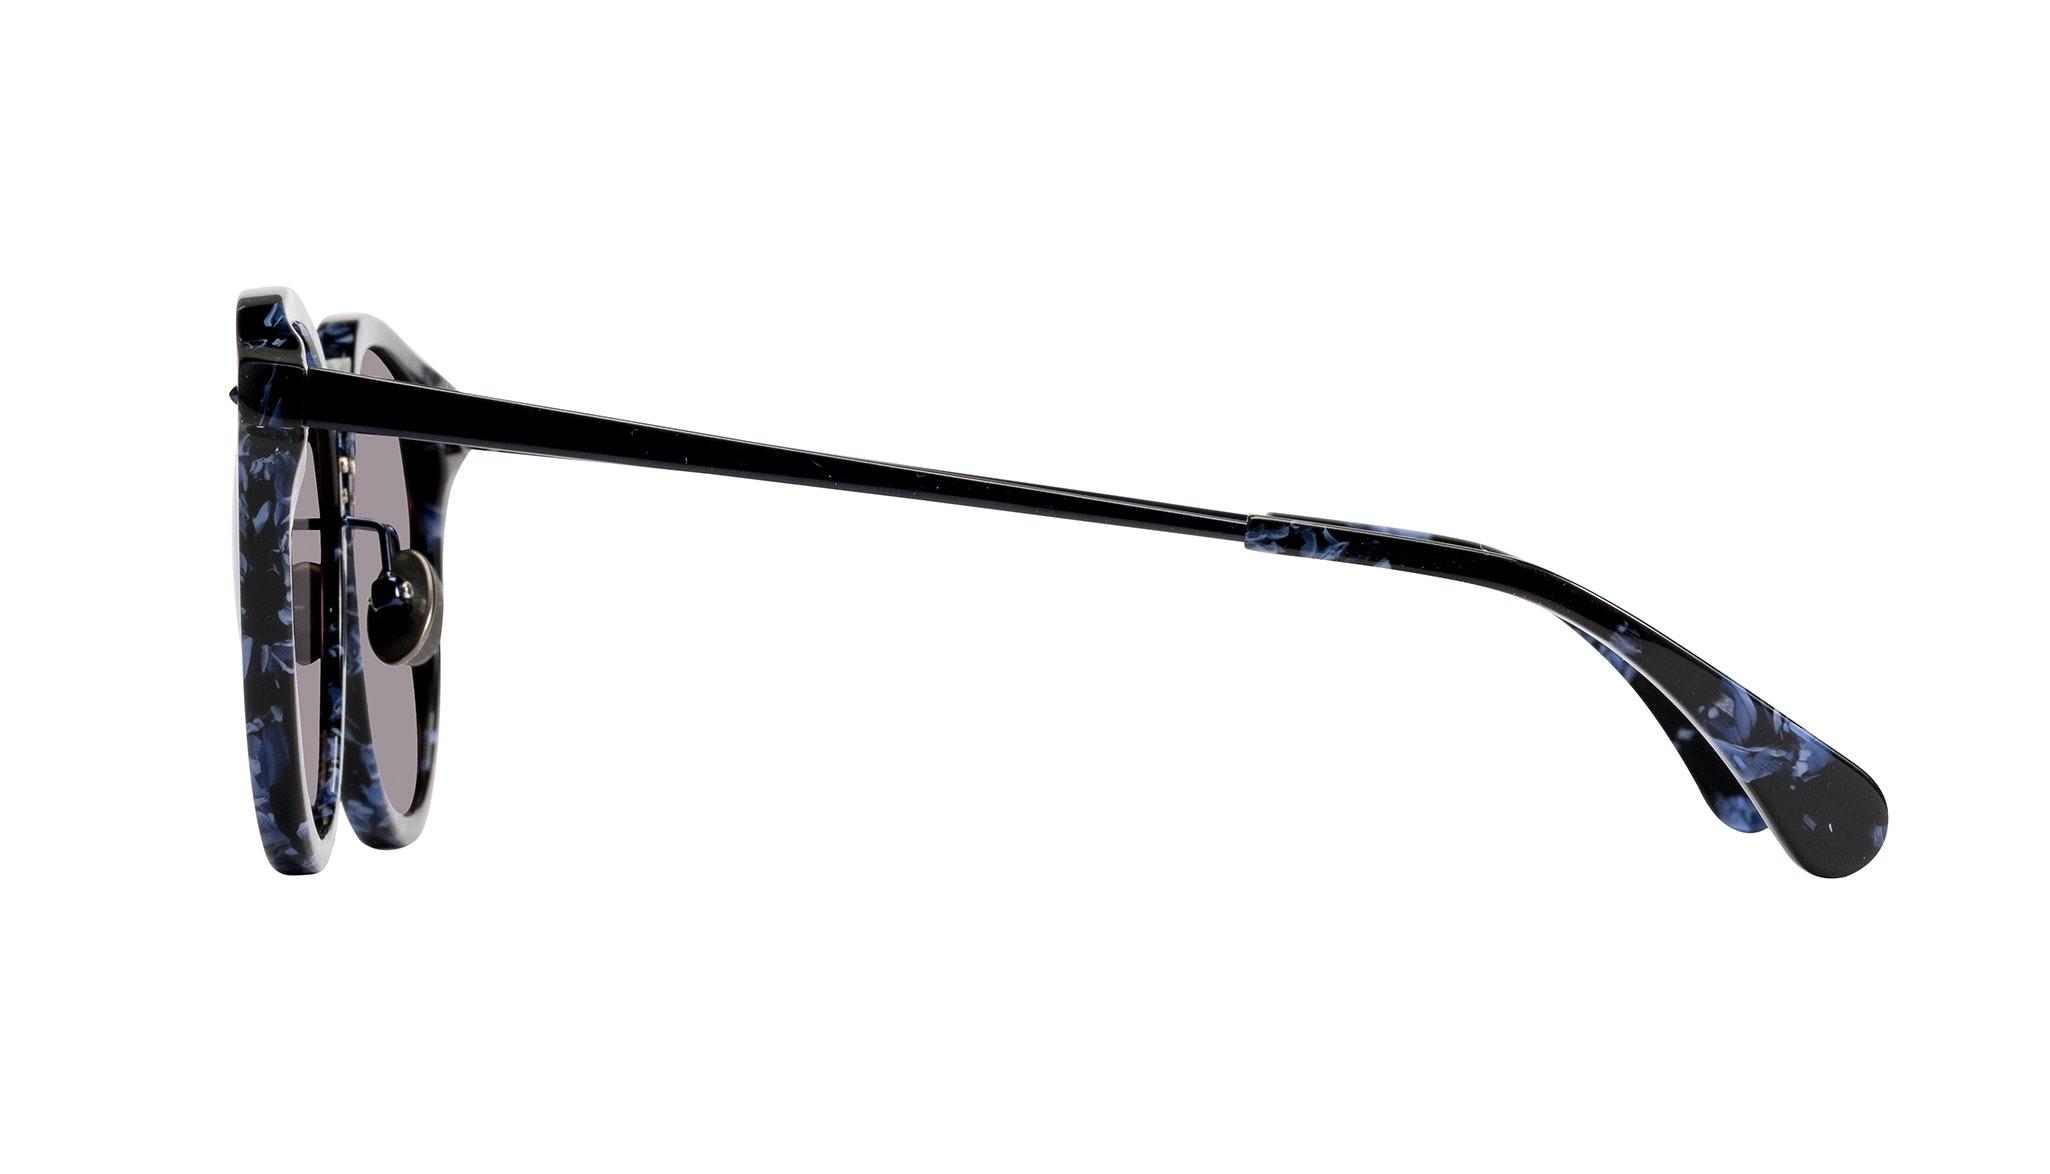 Affordable Fashion Glasses Round Sunglasses Women Poppy Rey Side